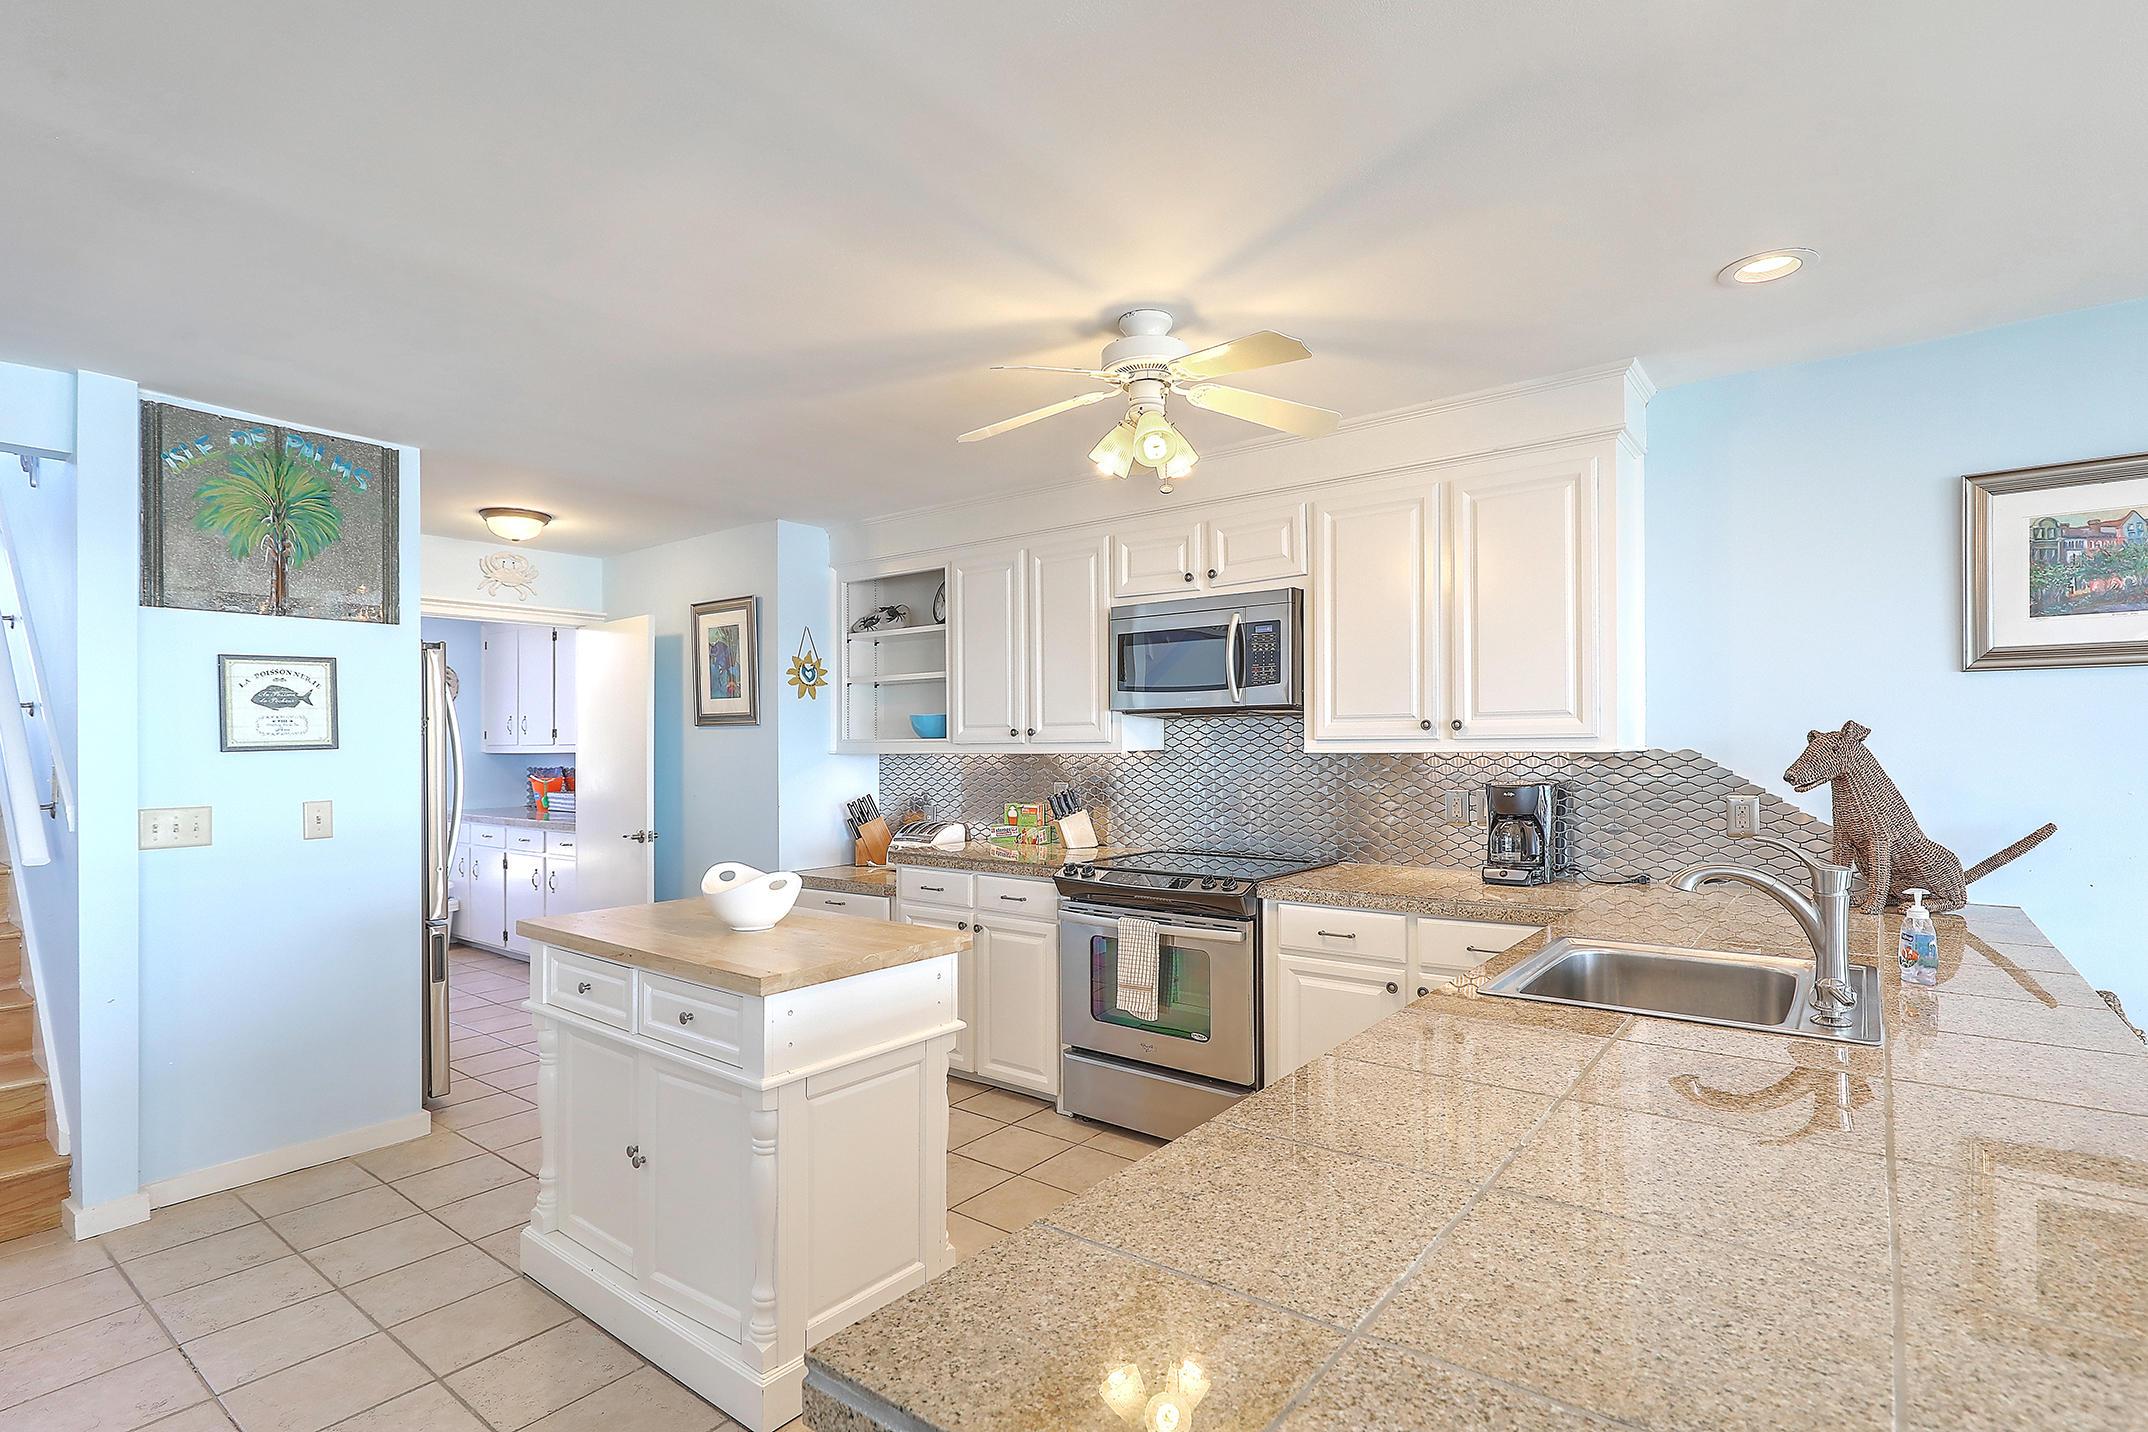 Wild Dunes Homes For Sale - 14 Beachwood East, Isle of Palms, SC - 11